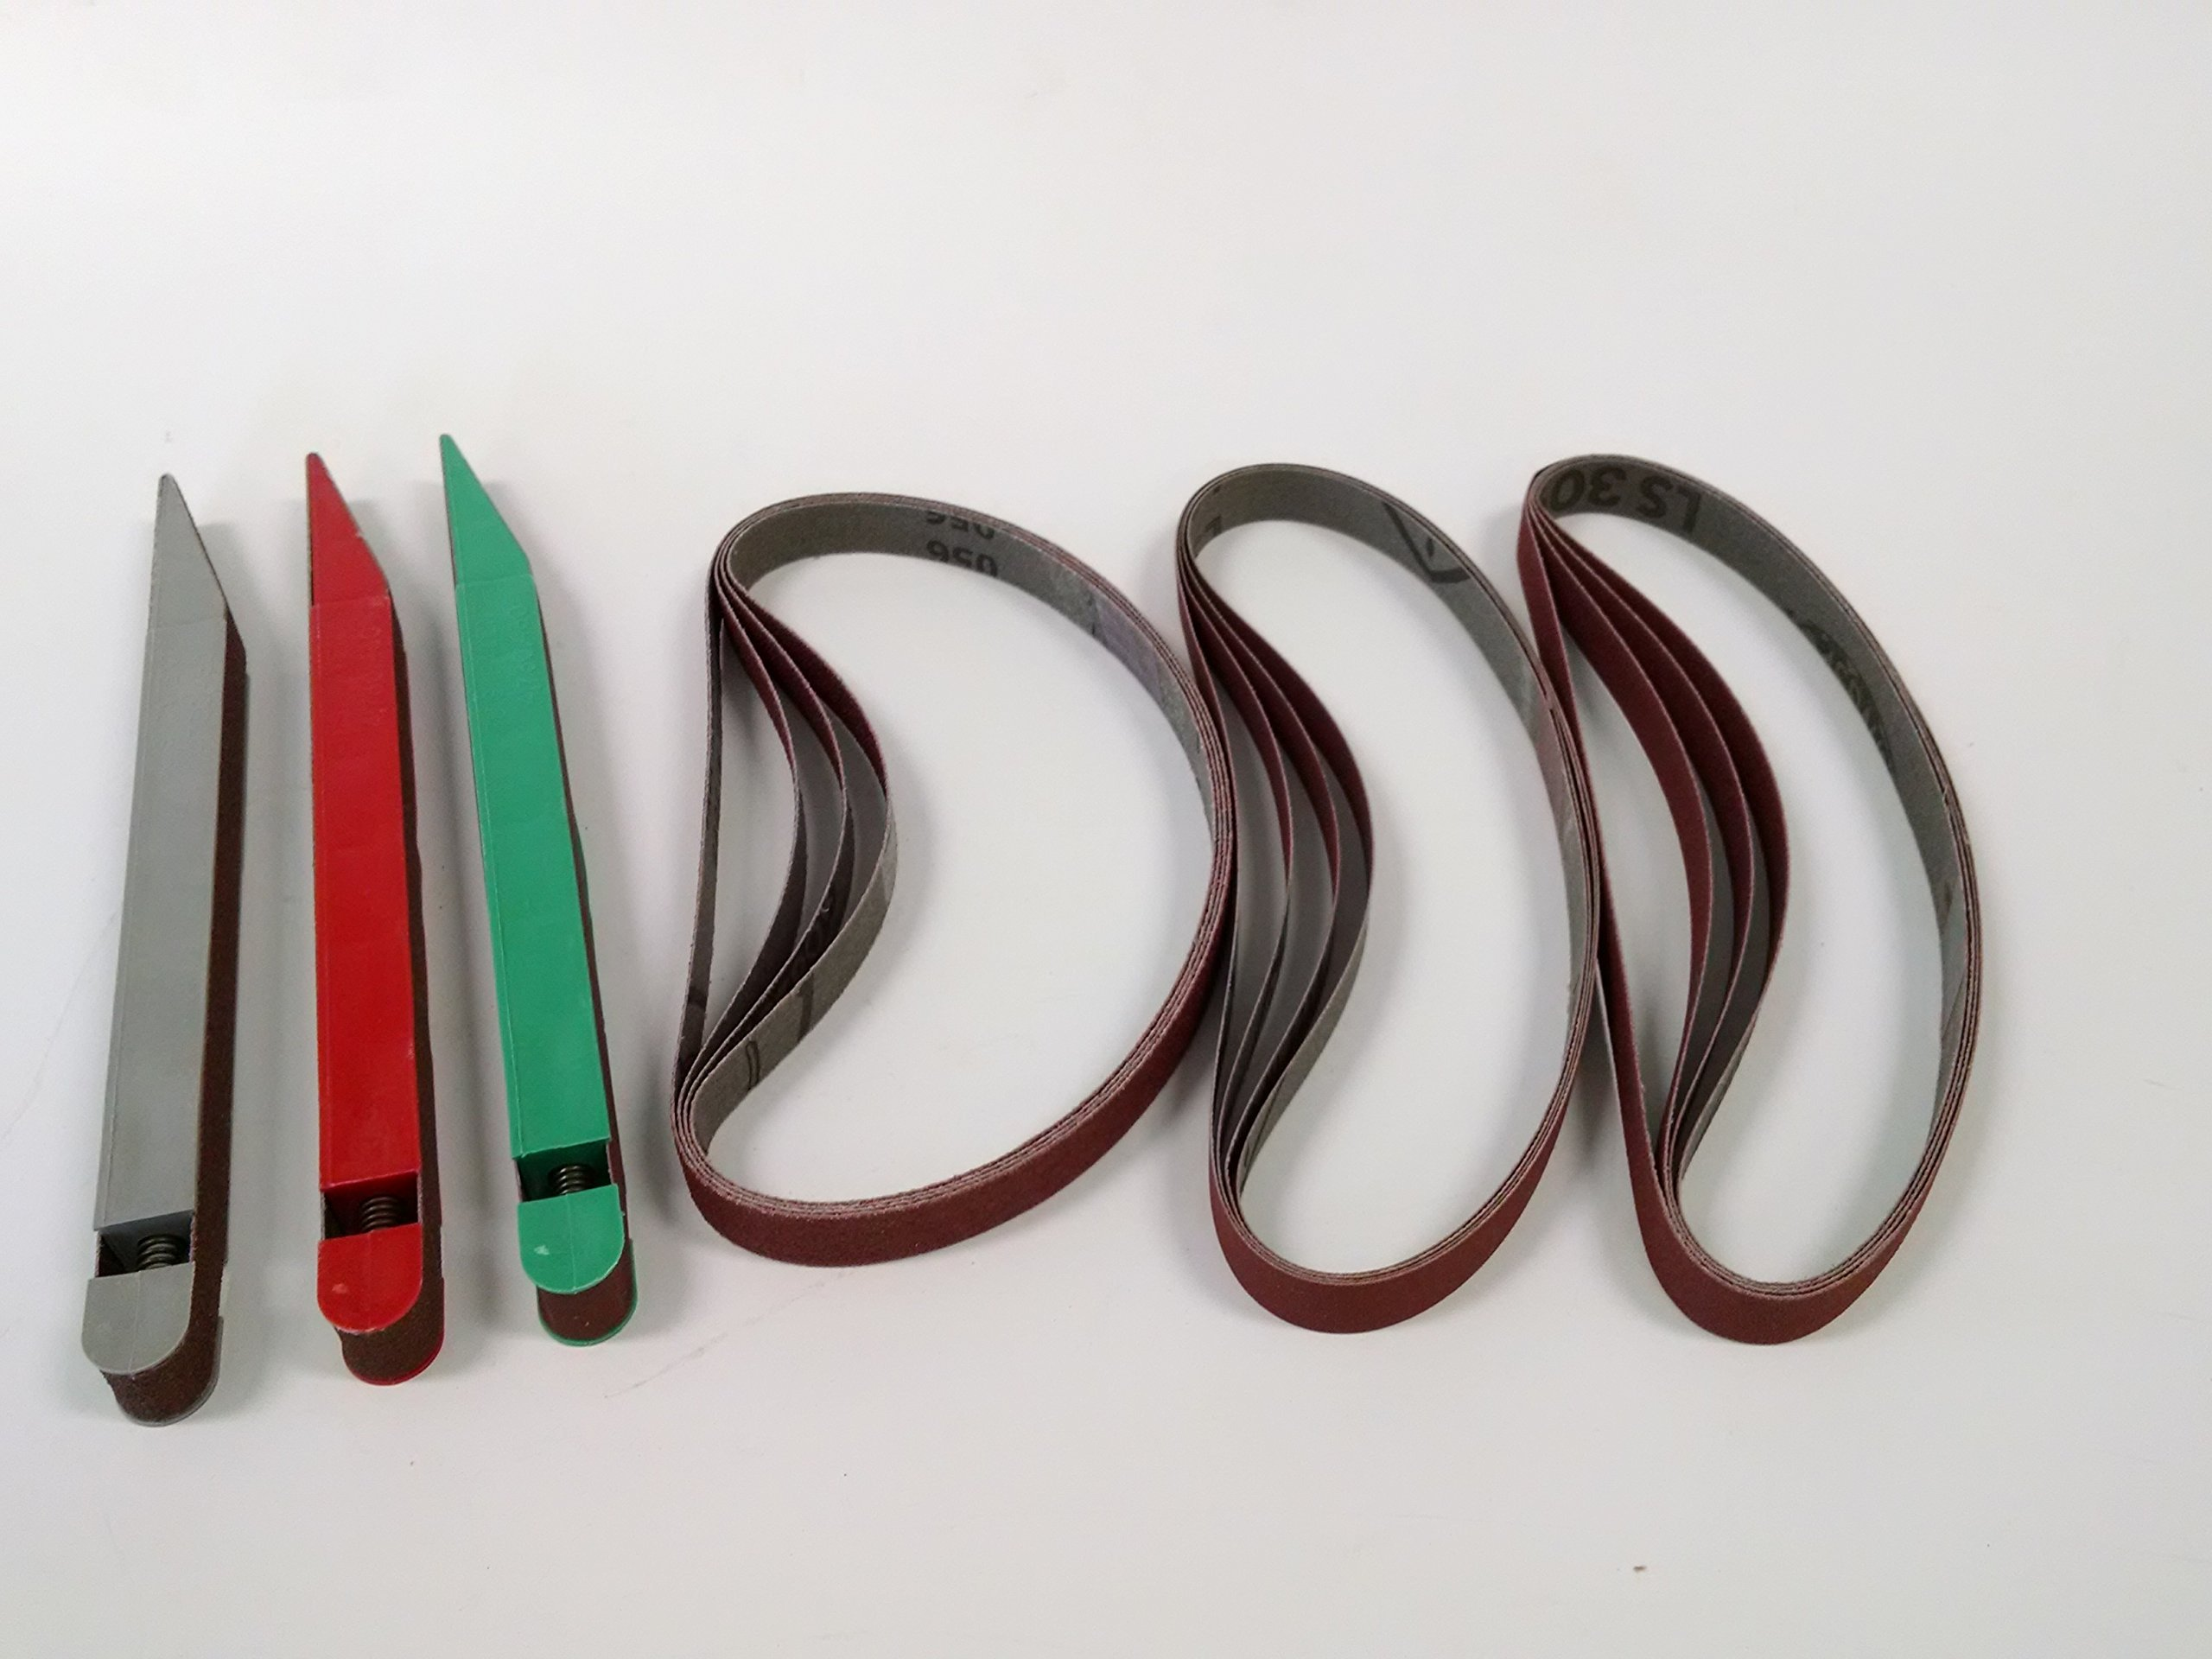 Sanding Sticks, 1/2 Inch Standard Kit